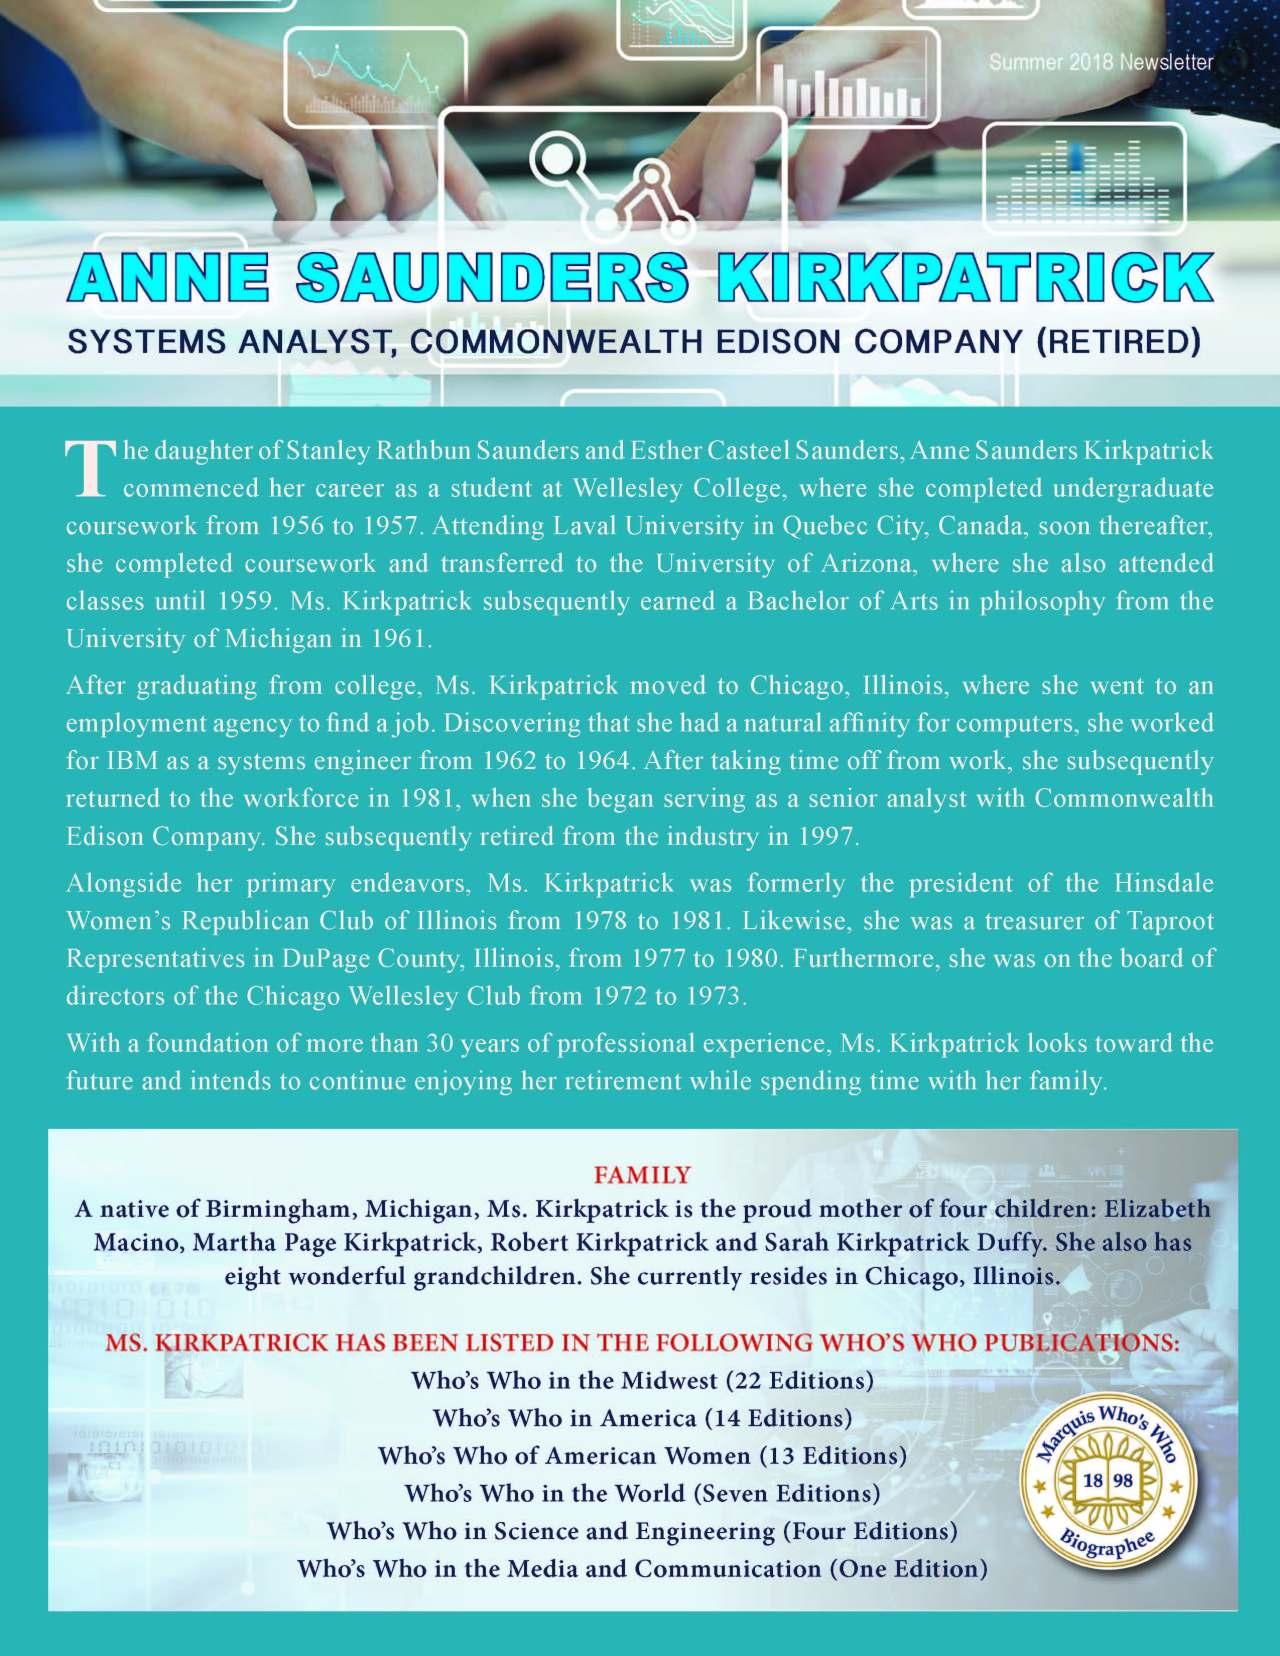 Kirkpatrick, Anne 3992666_3417091 Newsletter